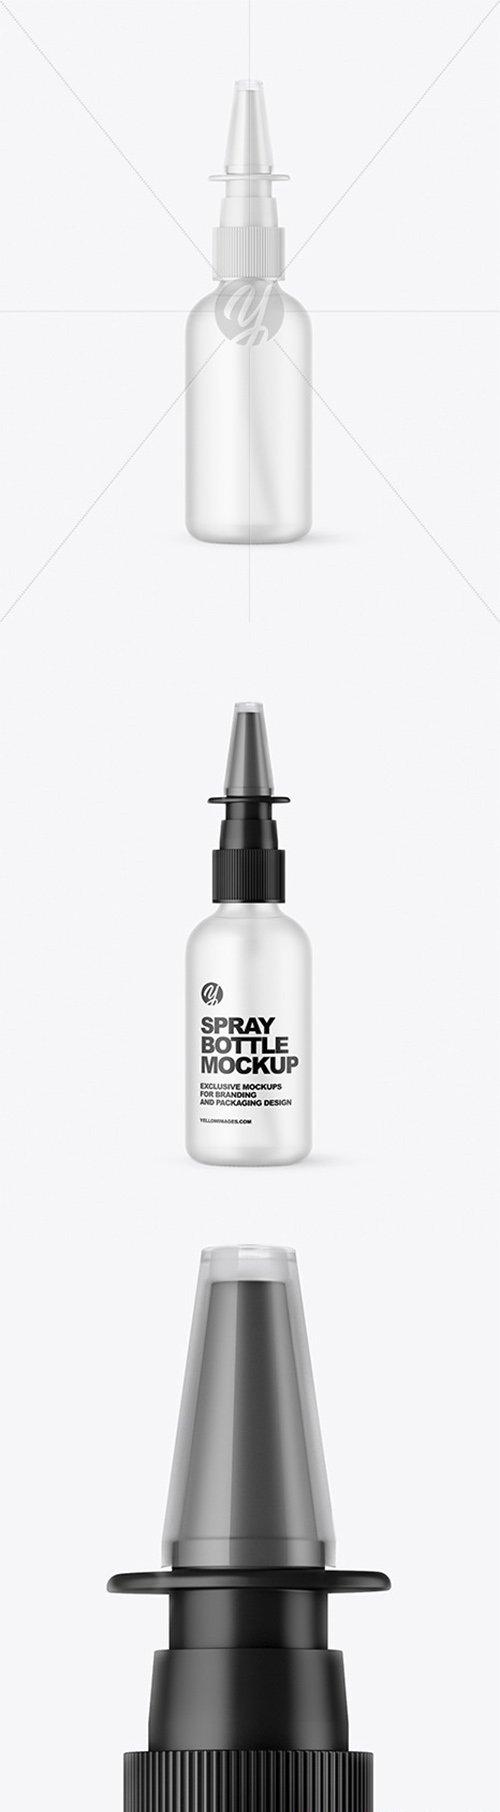 Frosted Glass Nasal Spray Bottle Mockup 66528